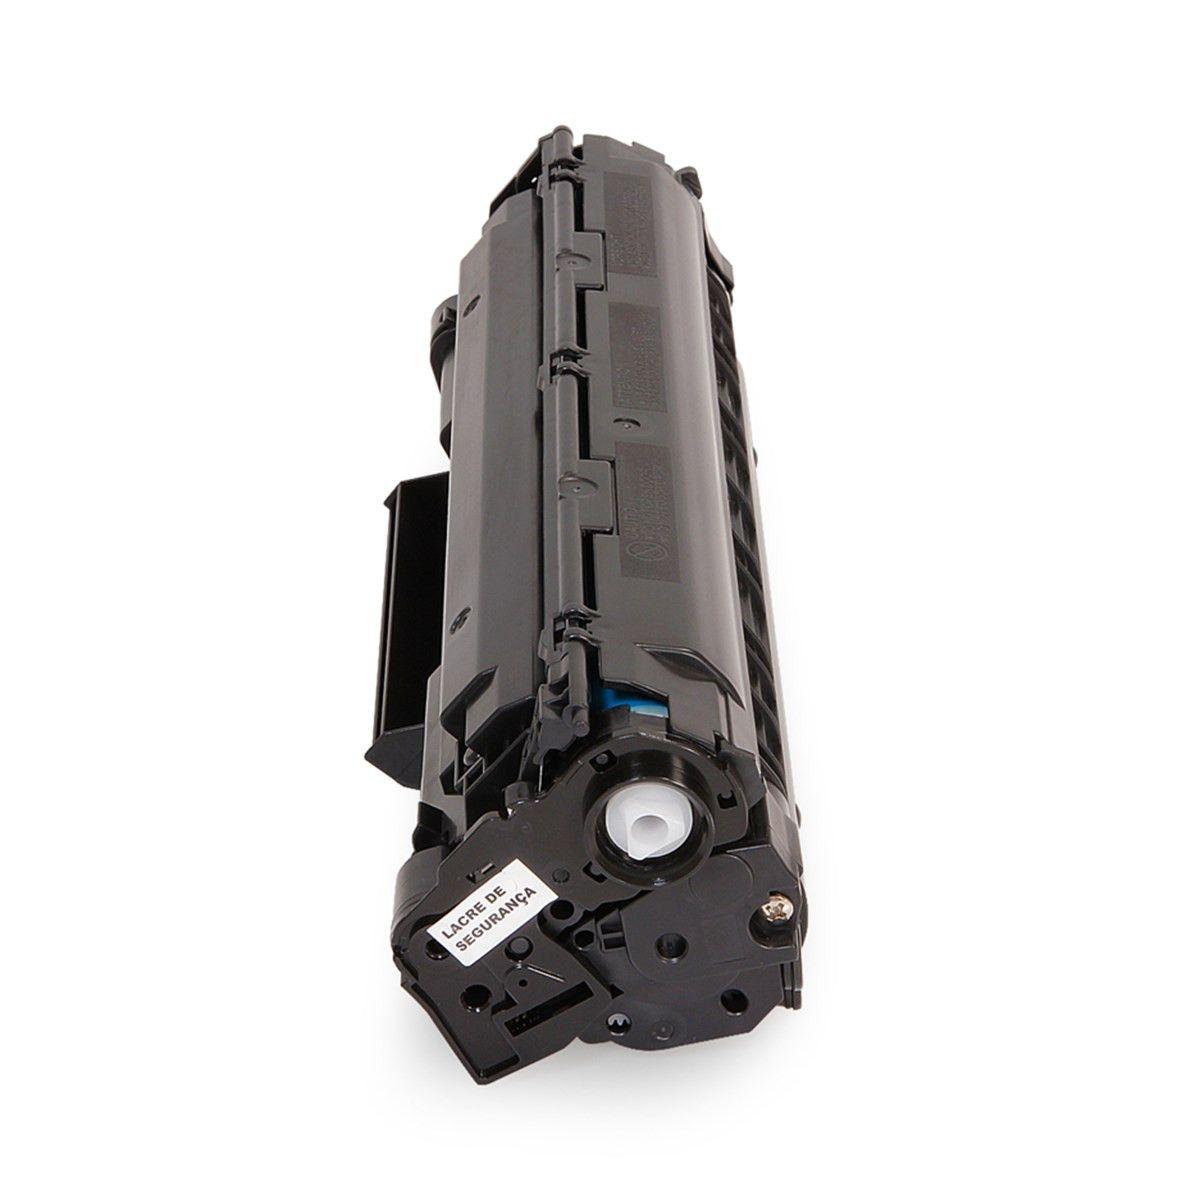 TONER COMPATÍVEL HP 83A | CF283A | M225 | M201 | M125 | M127 | M127FW | M127FN